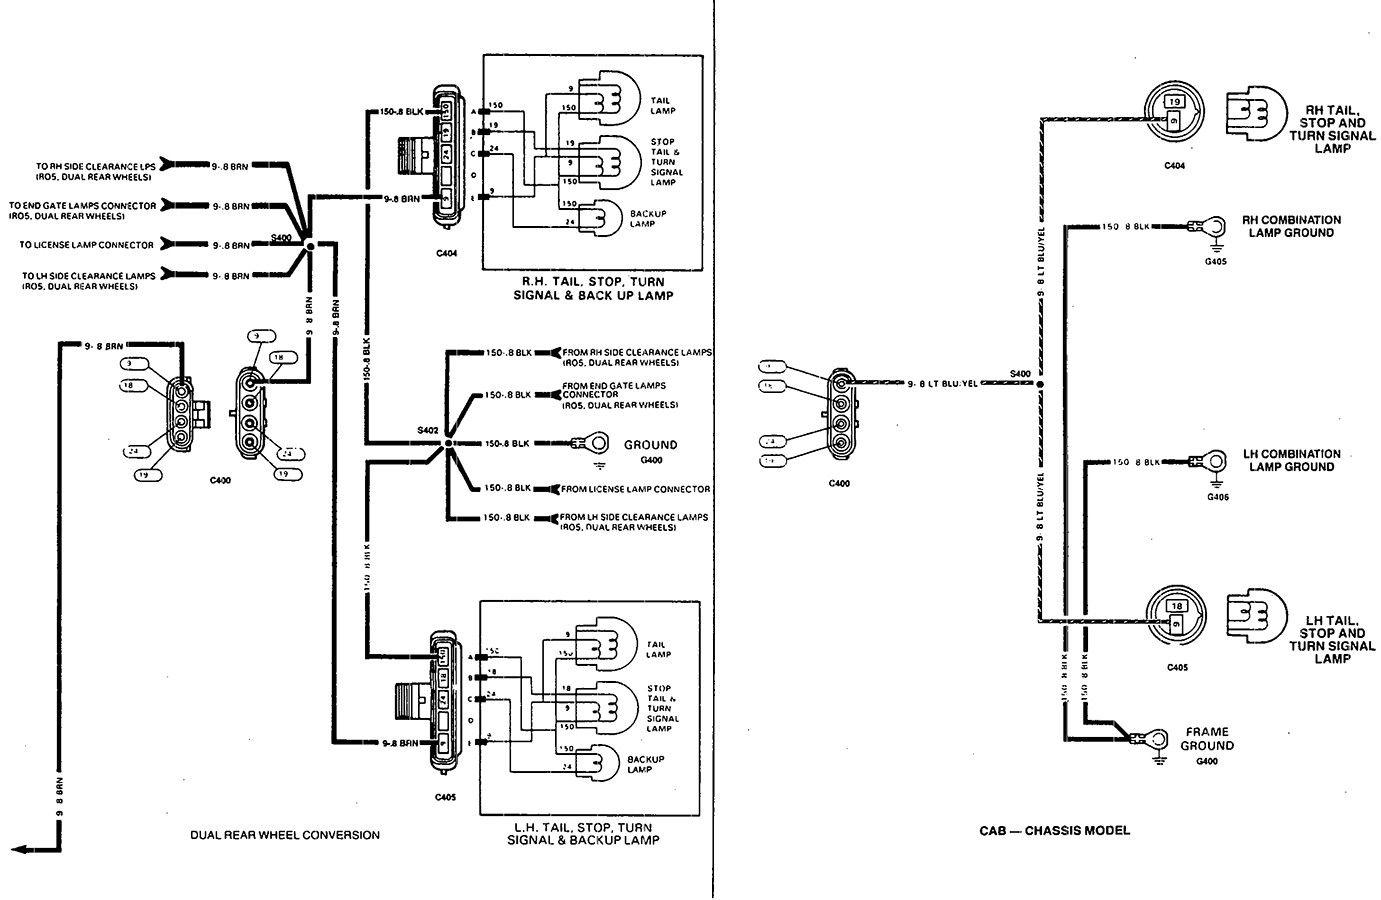 2004 Chevy Tail Light Electrical Diagram Electrical Diagram Chevy Silverado Trailer Wiring Diagram